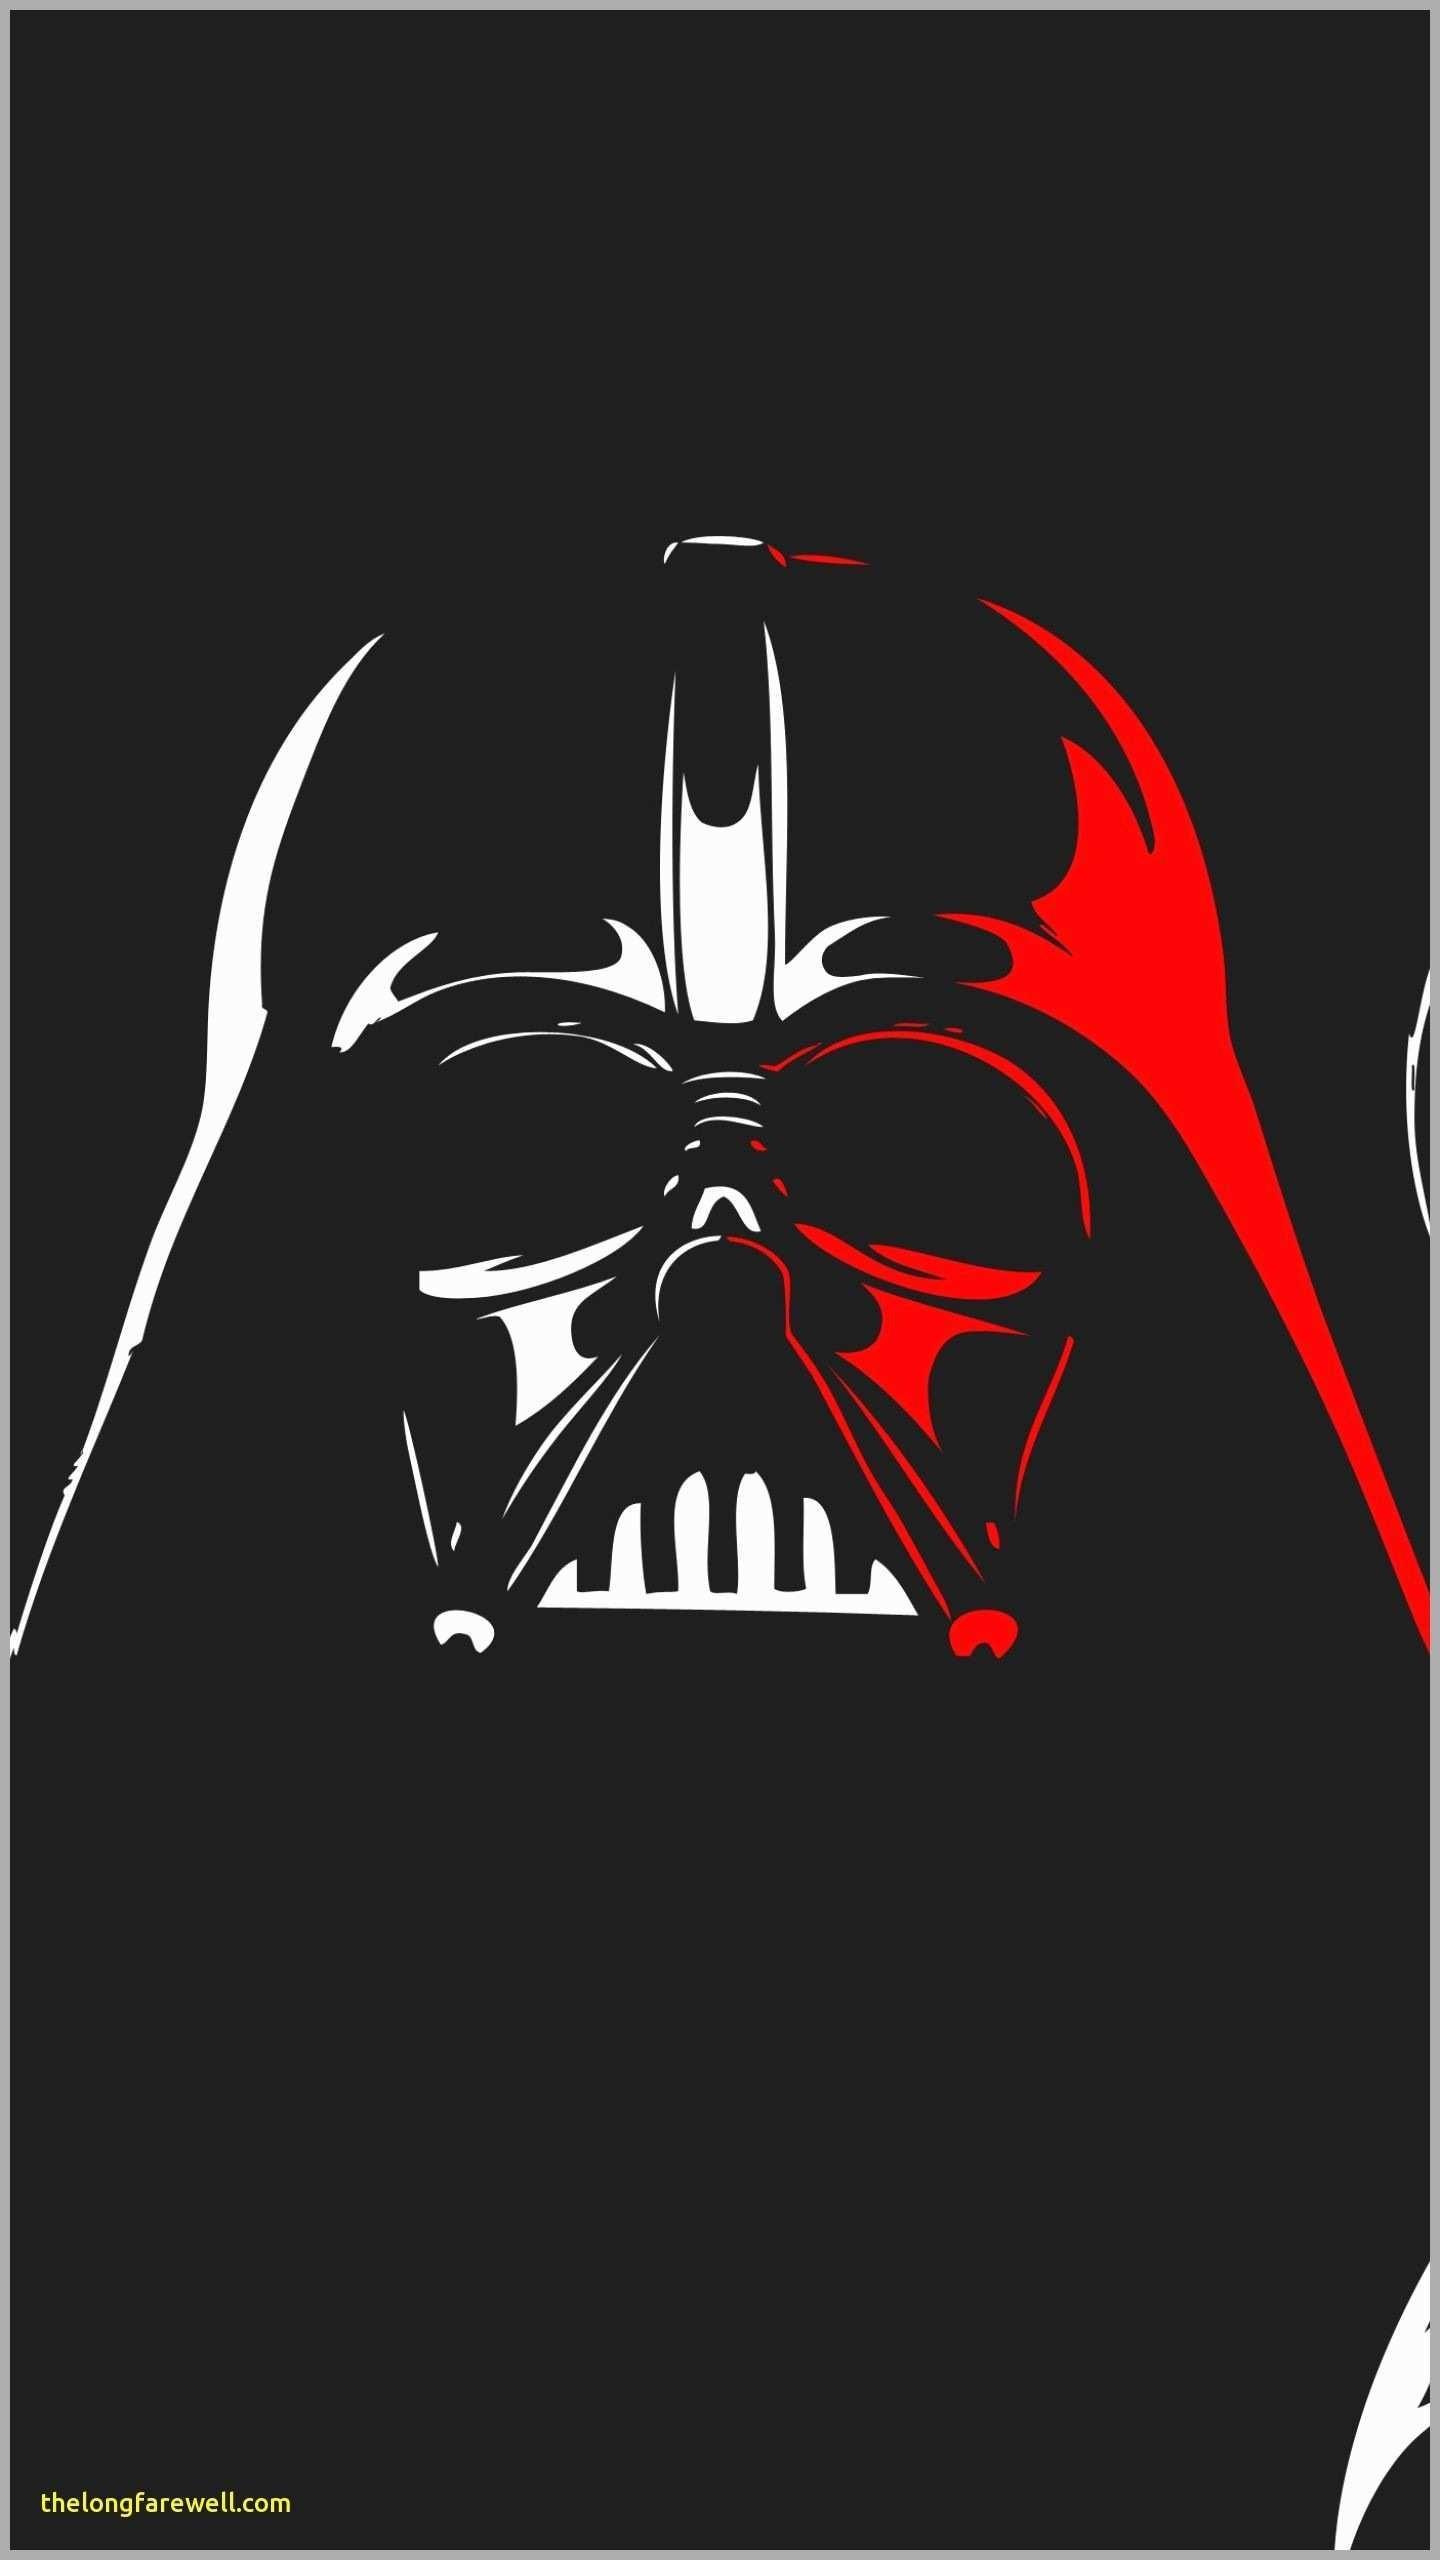 Emoji Wallpaper For Boys Wonderfully Elegant Star Wars Best Wallpapers For Boys 1440x2560 Wallpaper Teahub Io